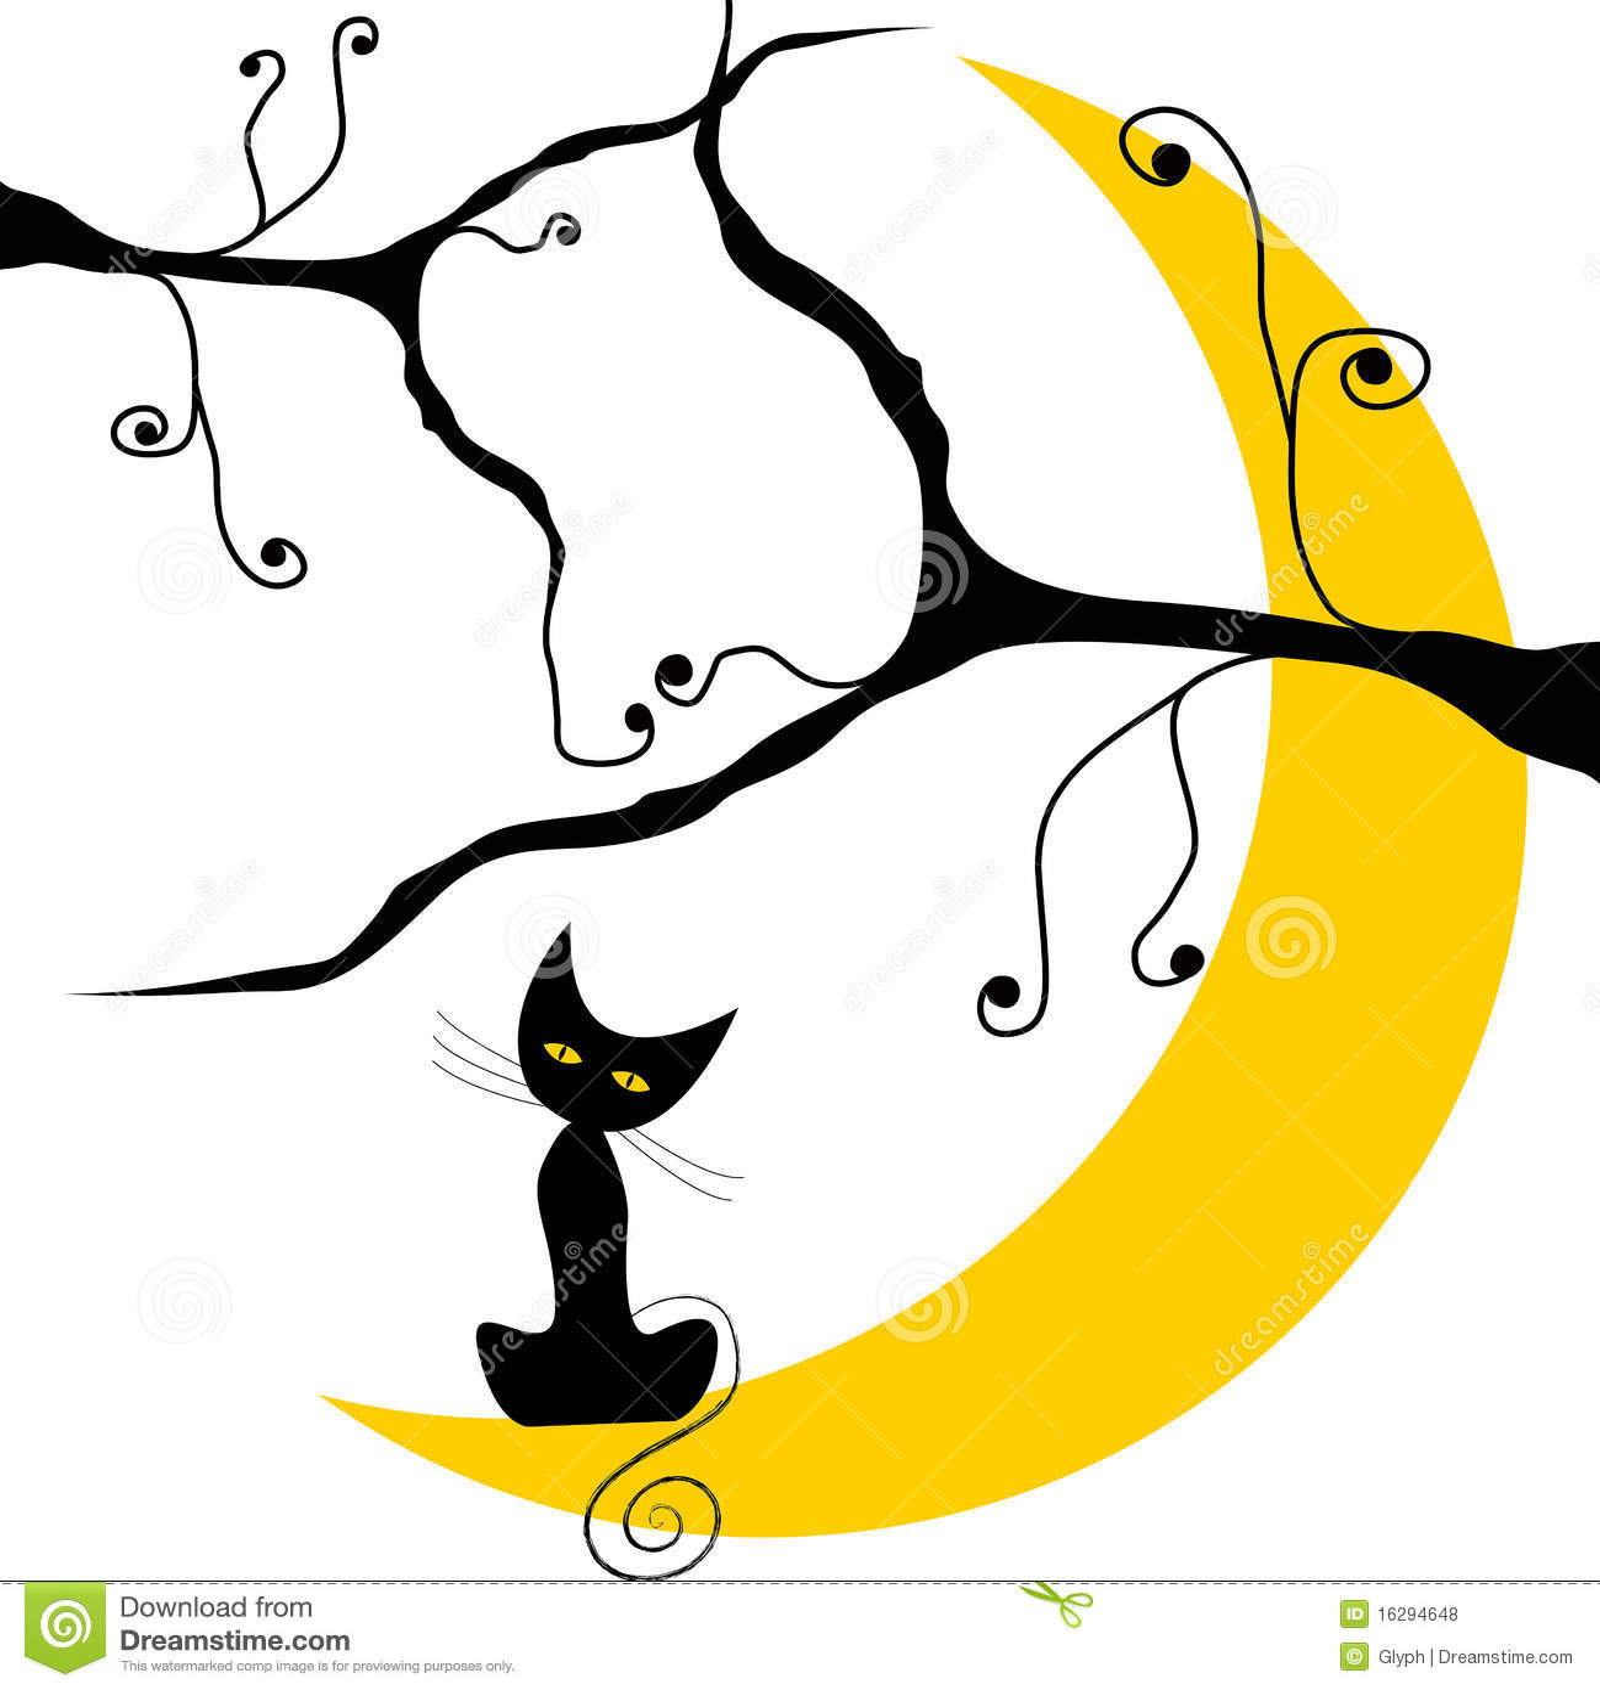 Cute Halloween Decorations Pinterest: Cute Halloween Cat Royalty Free Stock Photos